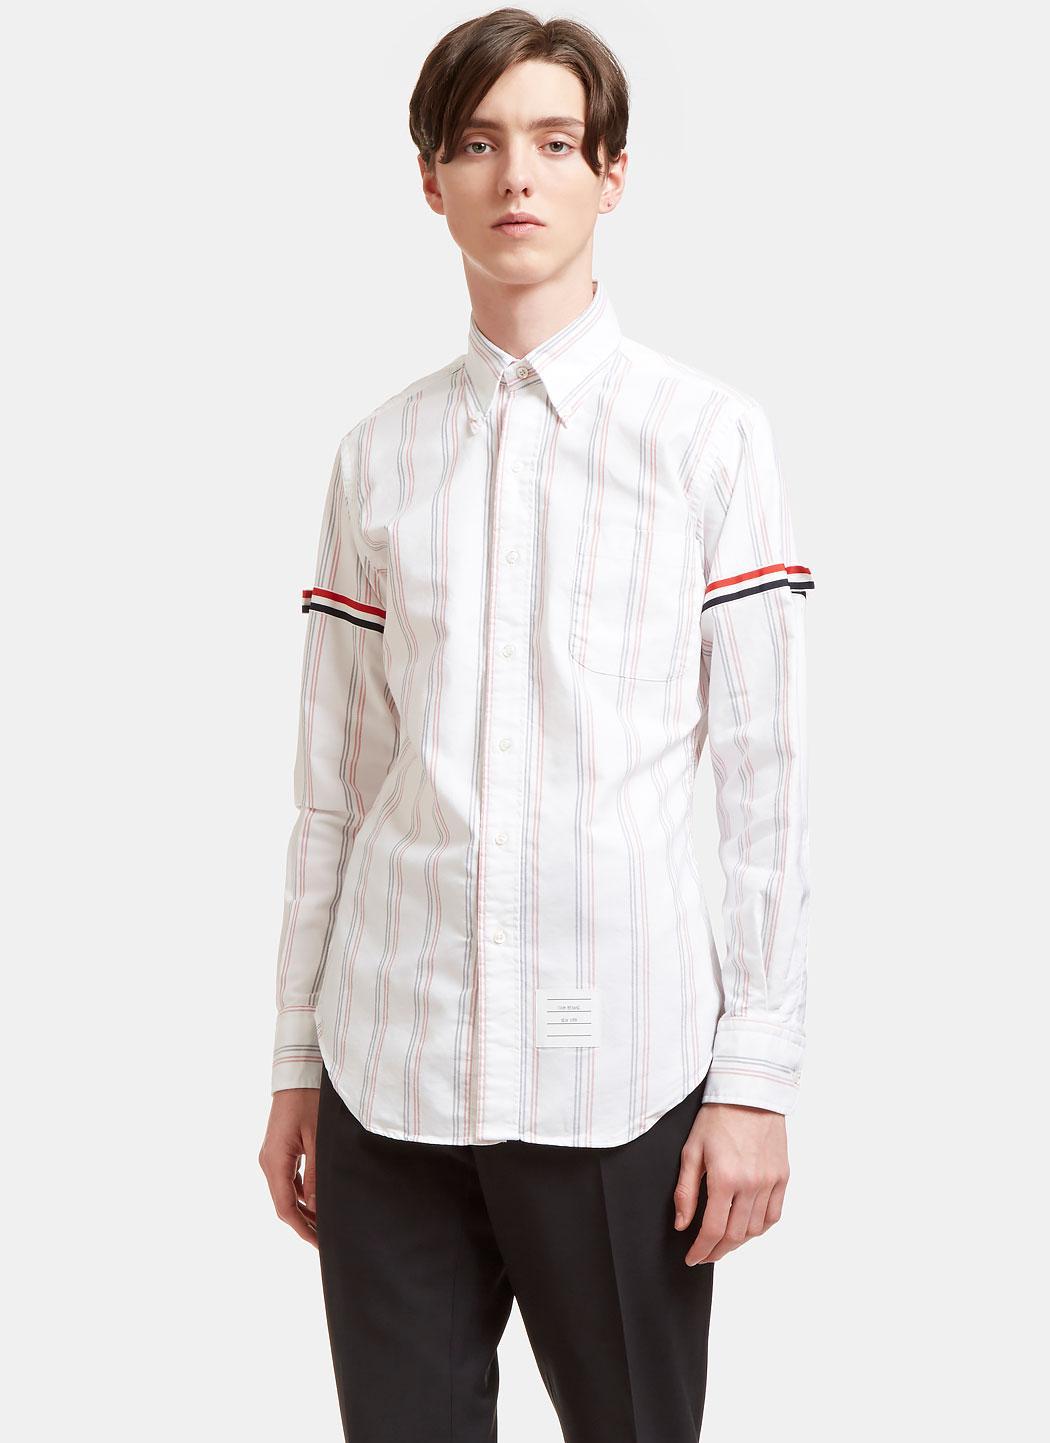 Thom browne men 39 s railway striped grosgrain ribbon armband for Thom browne white shirt